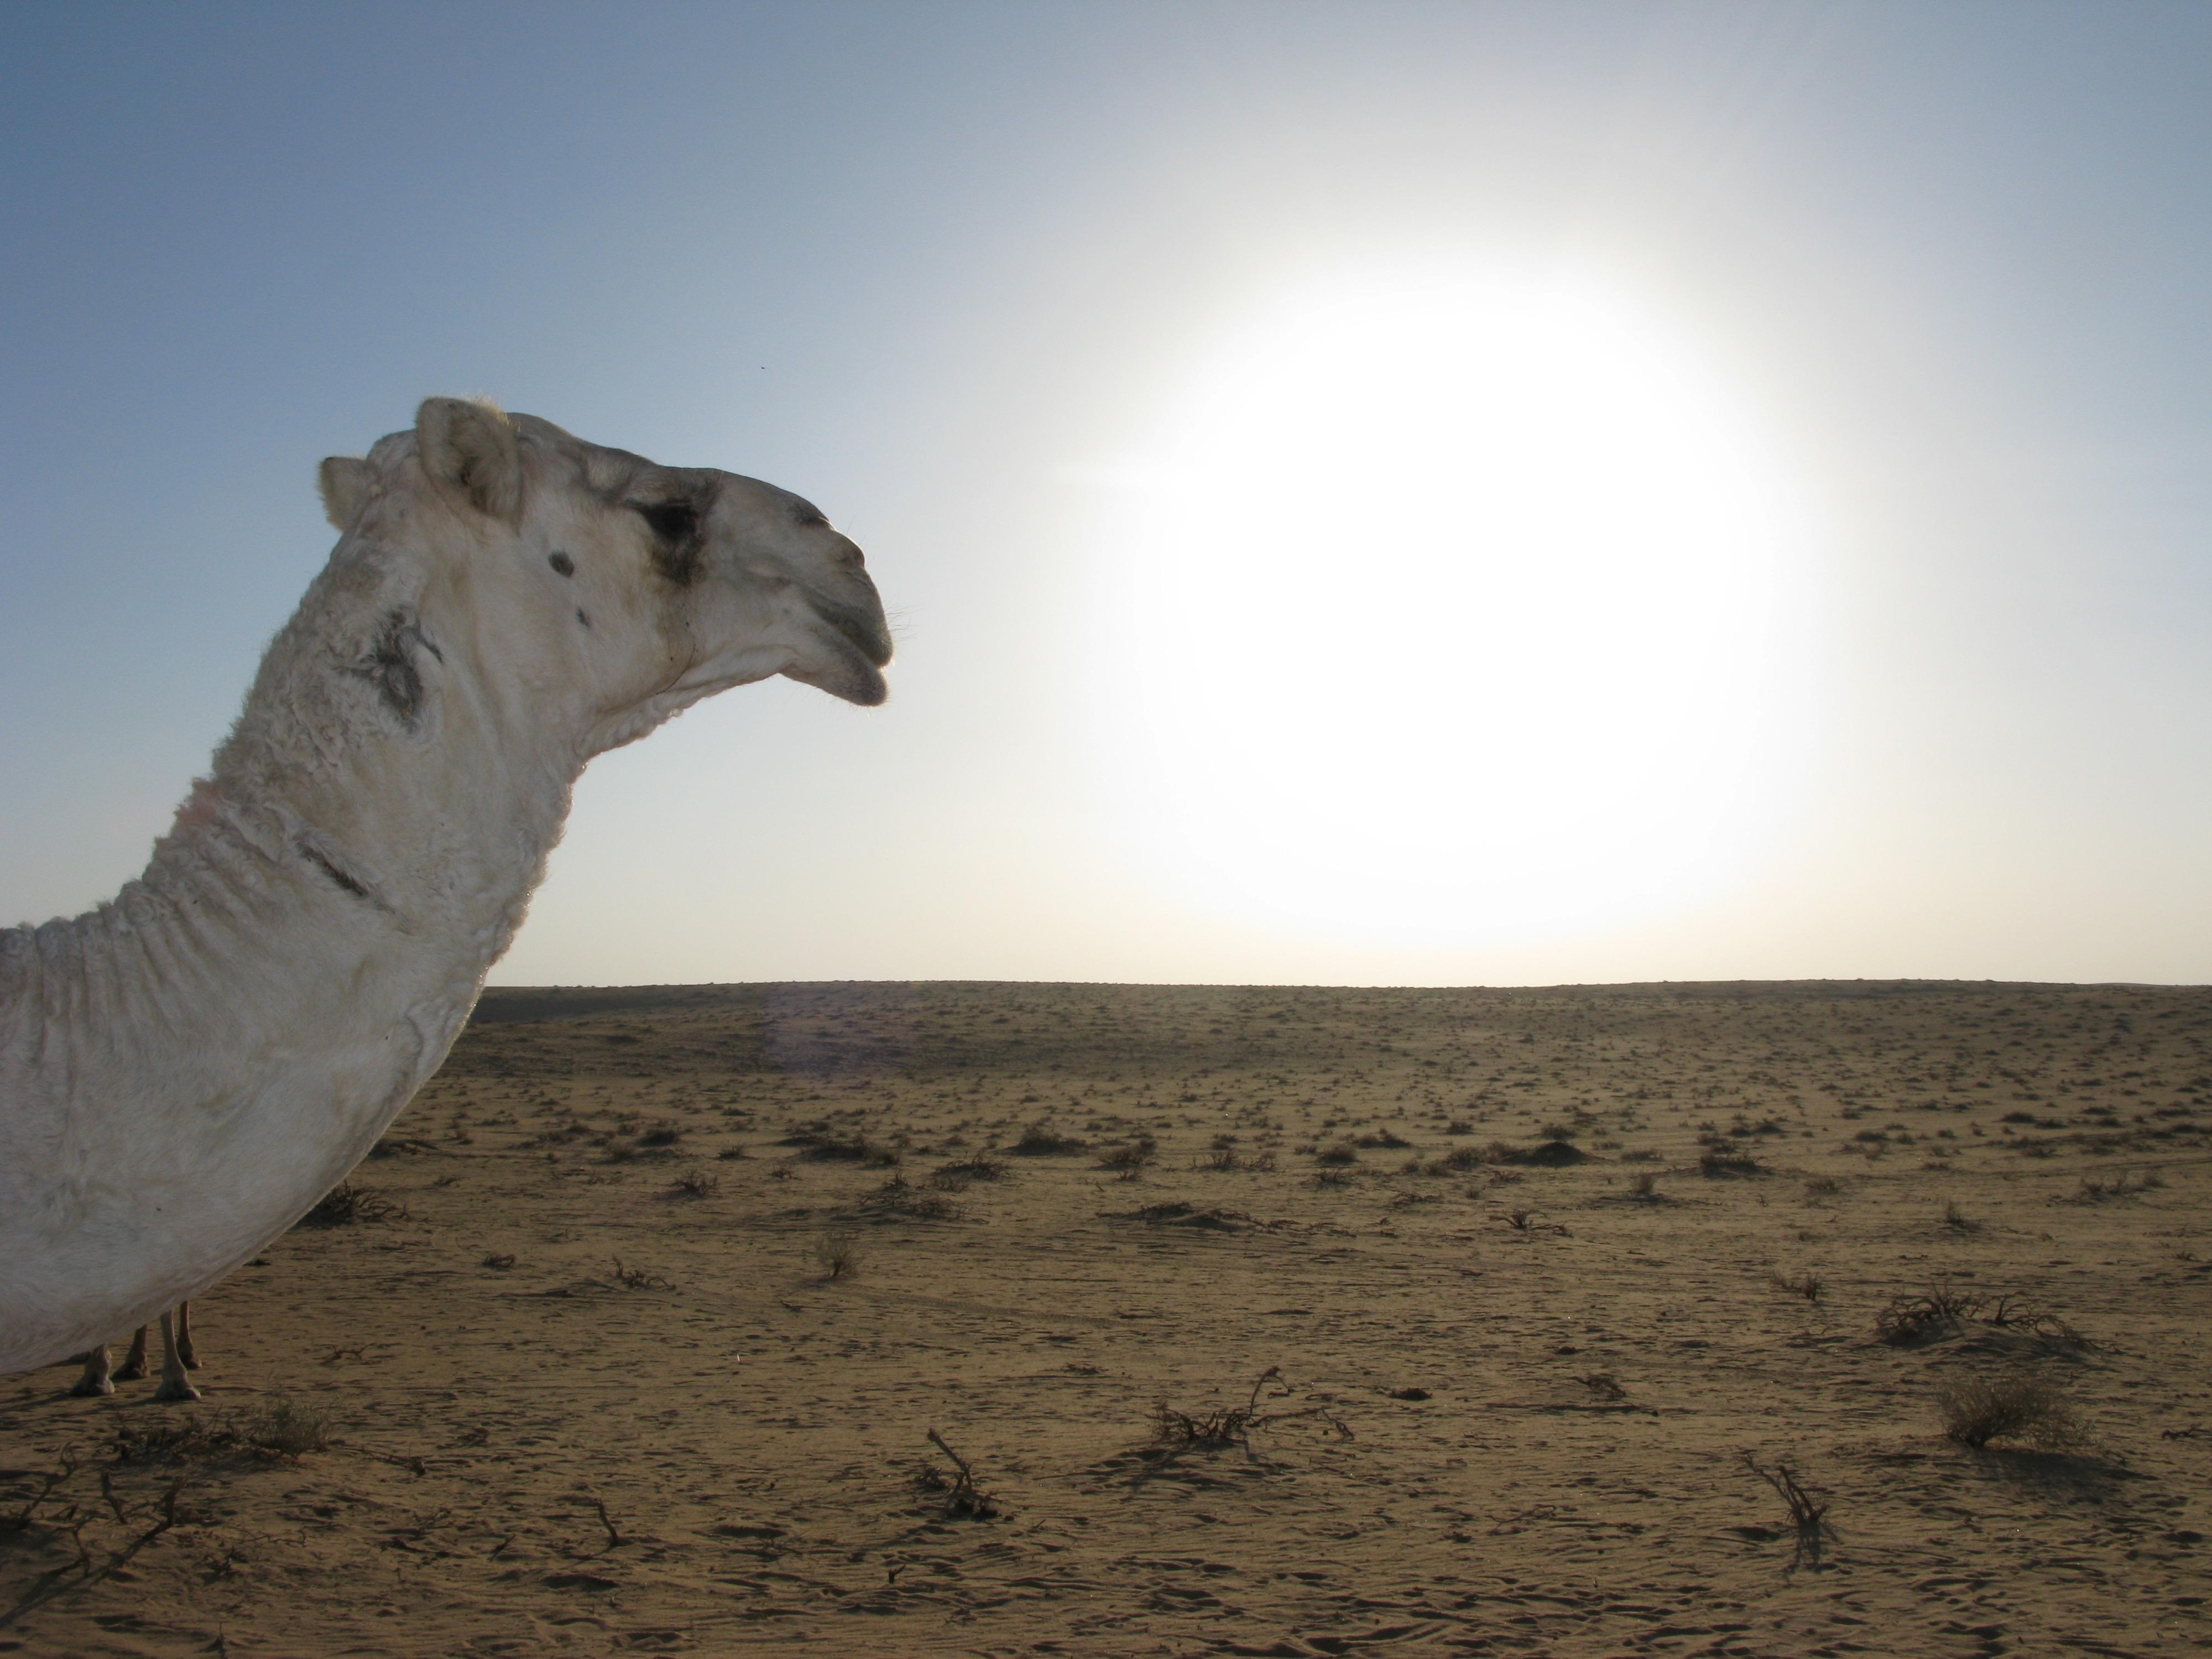 images gratuites paysage mer le sable d sert chameau. Black Bedroom Furniture Sets. Home Design Ideas